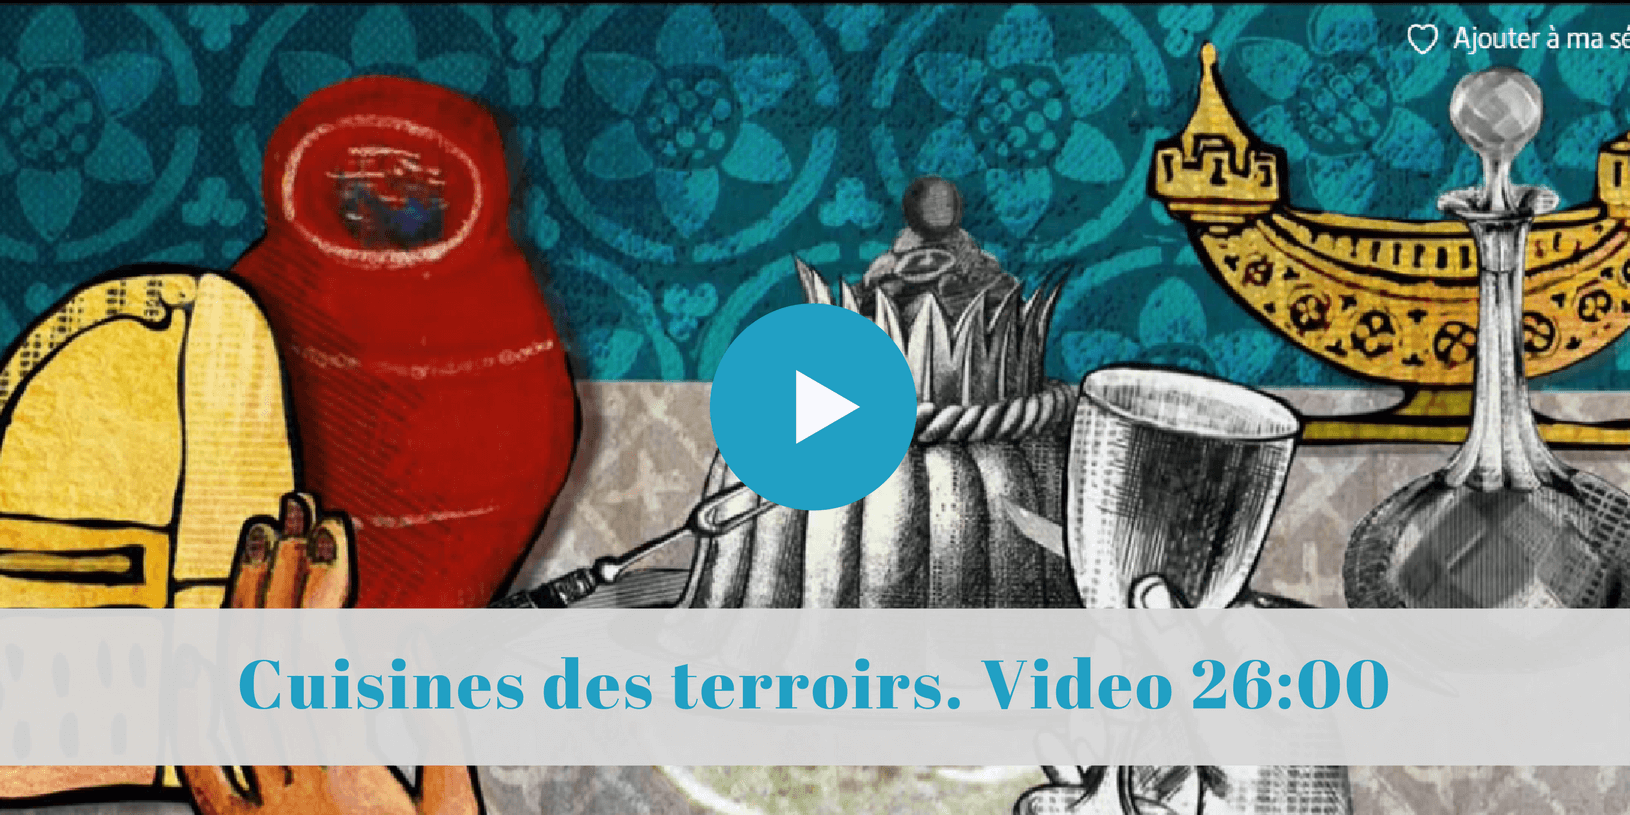 Cuisines du terroir via Arte